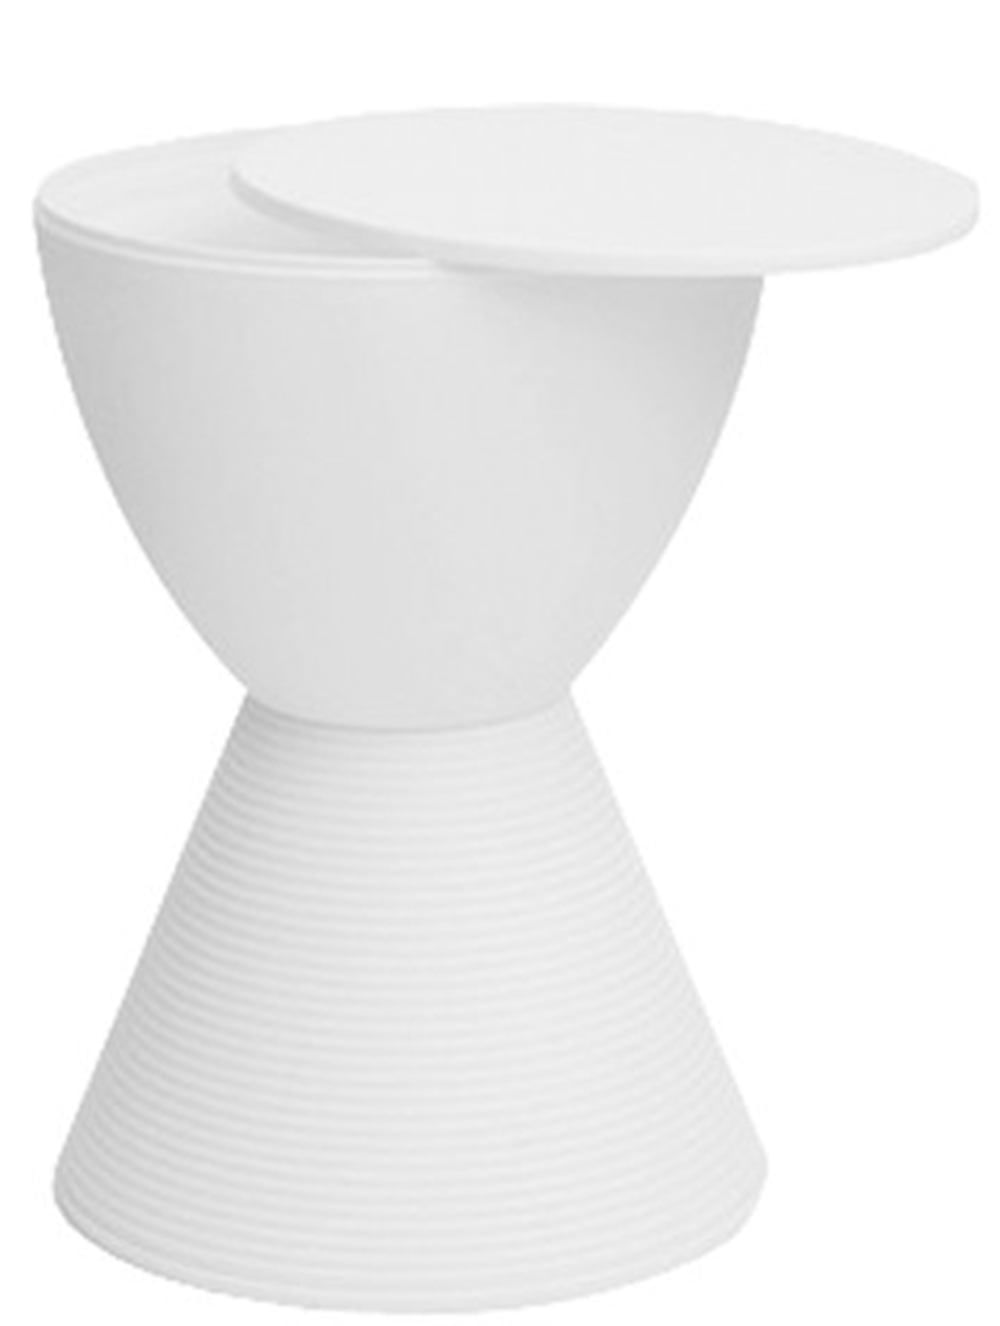 Banqueta Pawn com Tampo Branco - 14003